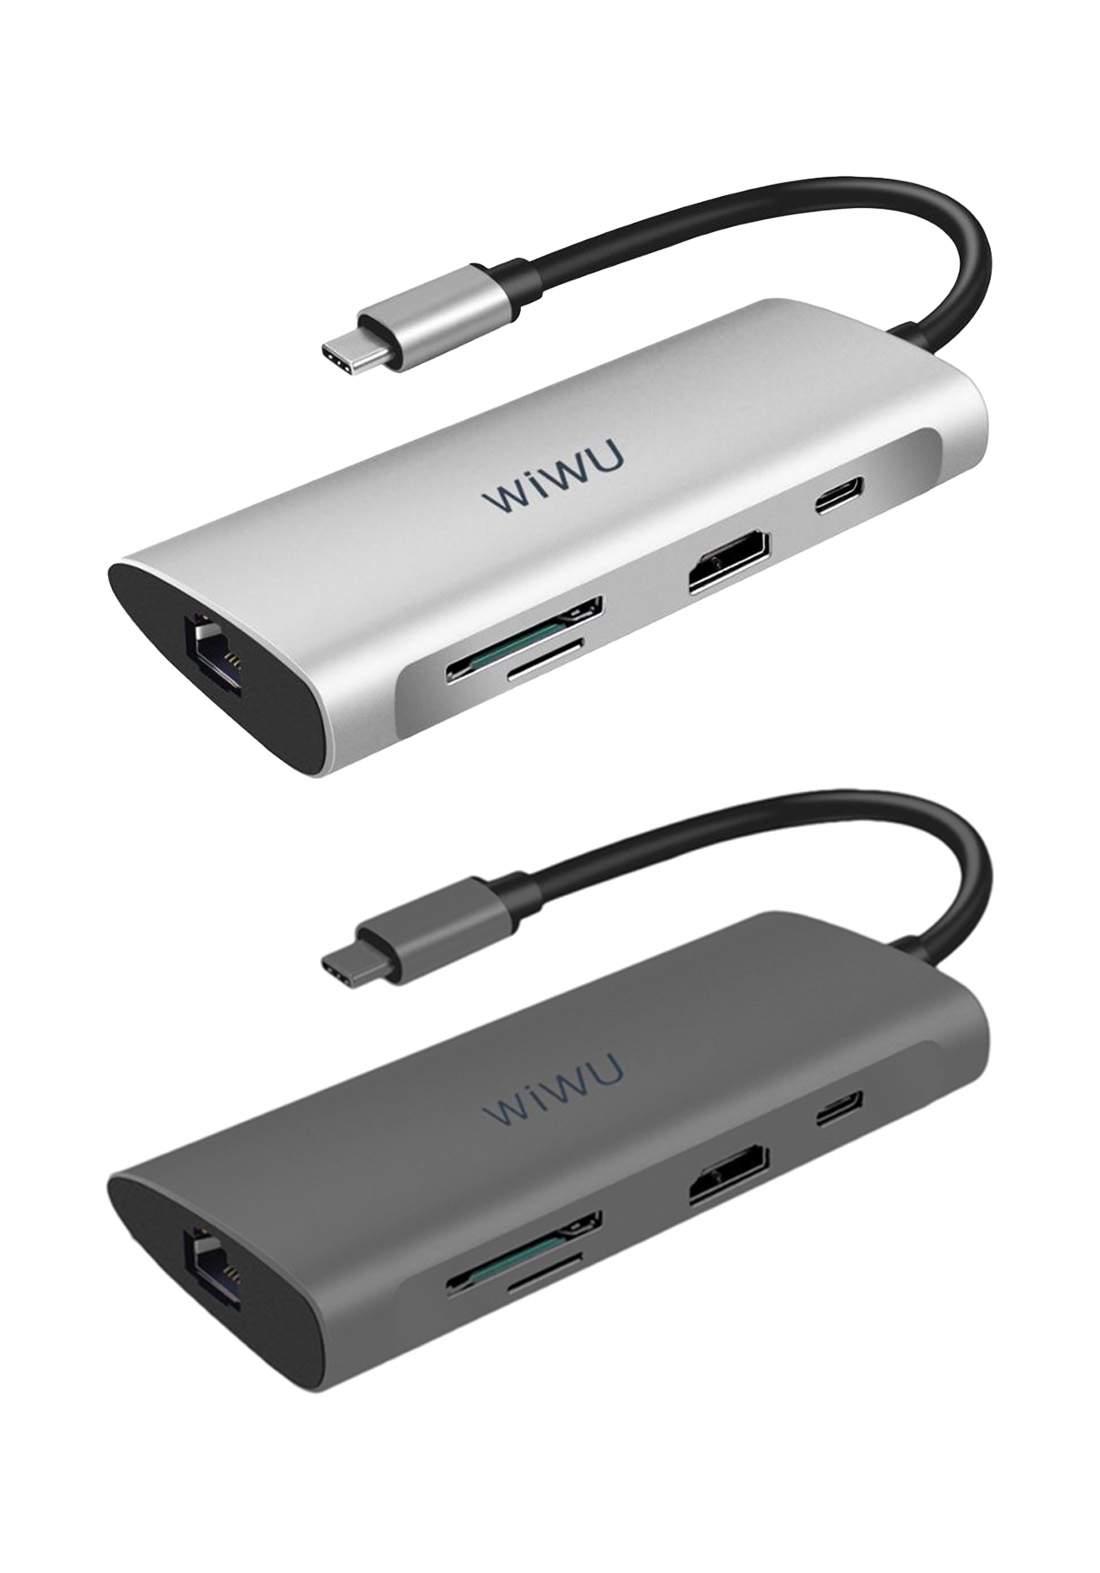 WIWU A831HRT USB Alpha 8in1 USB-C Hub